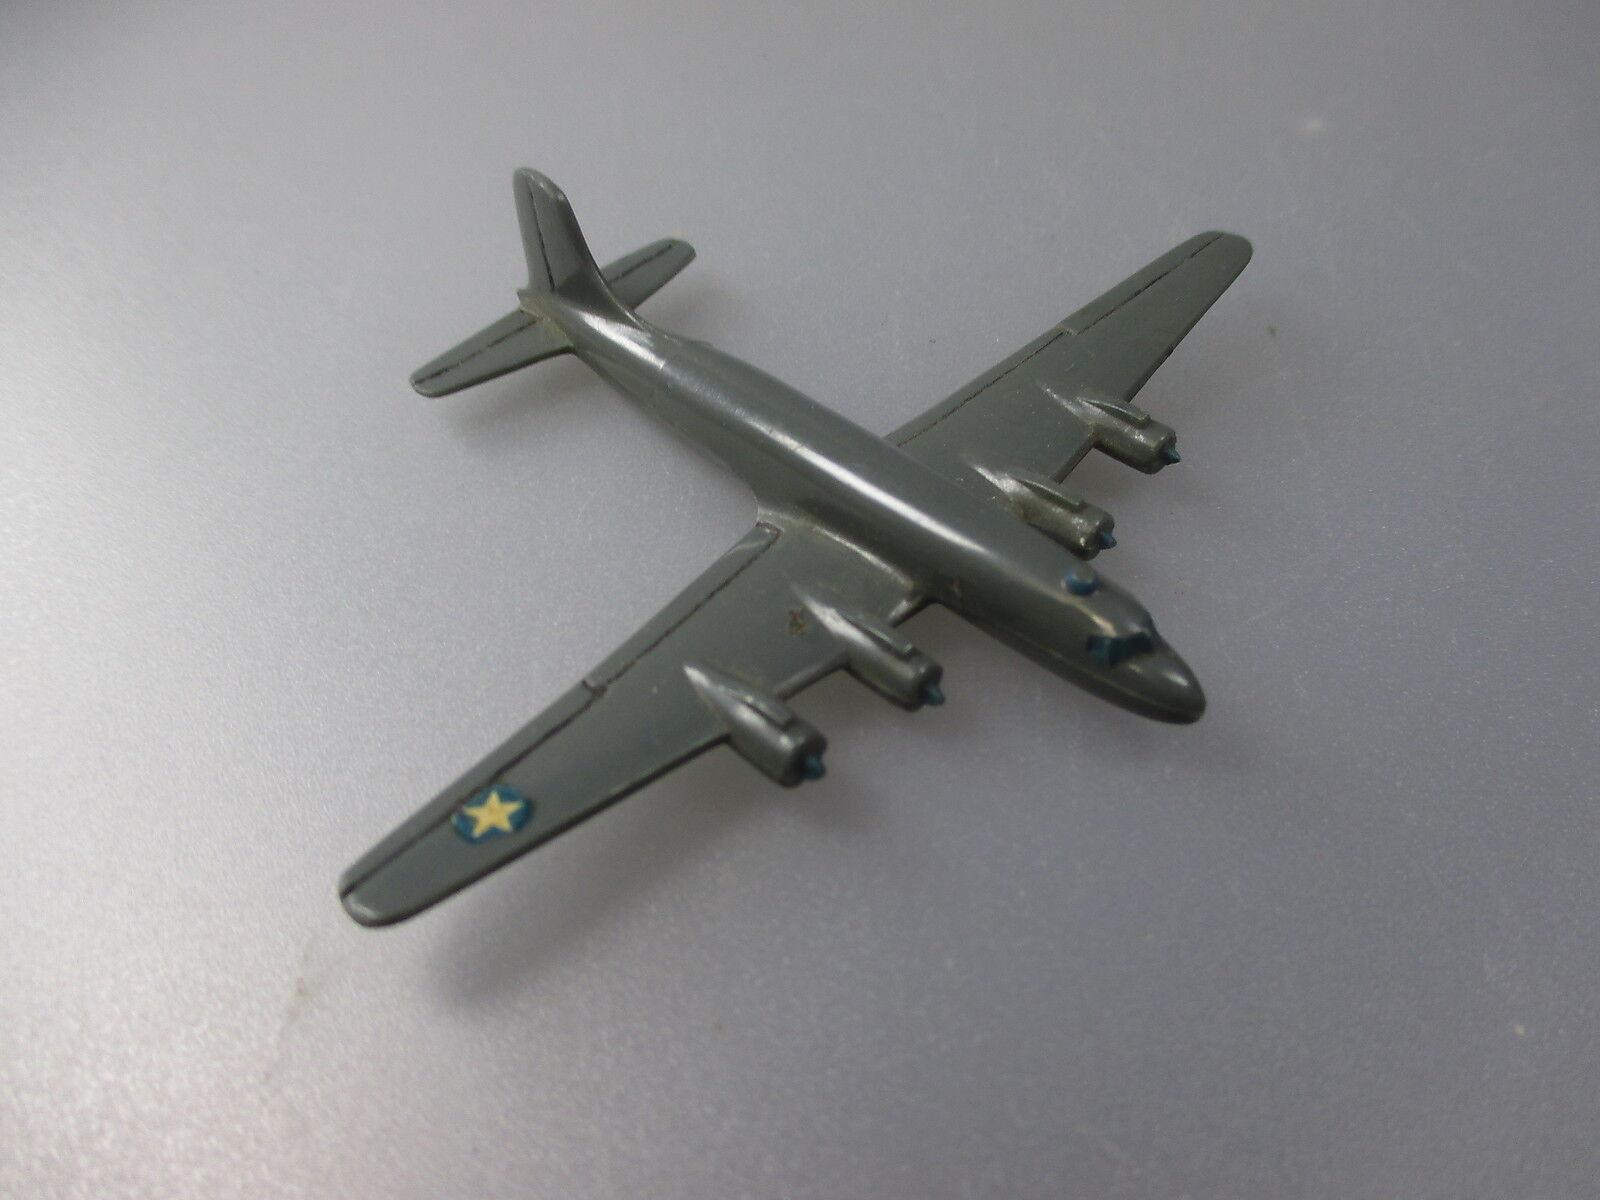 Wiking  aereo c-54 Skymaster da ponti aerei-serie in grigio verde, 1 400 (recidiva) 11